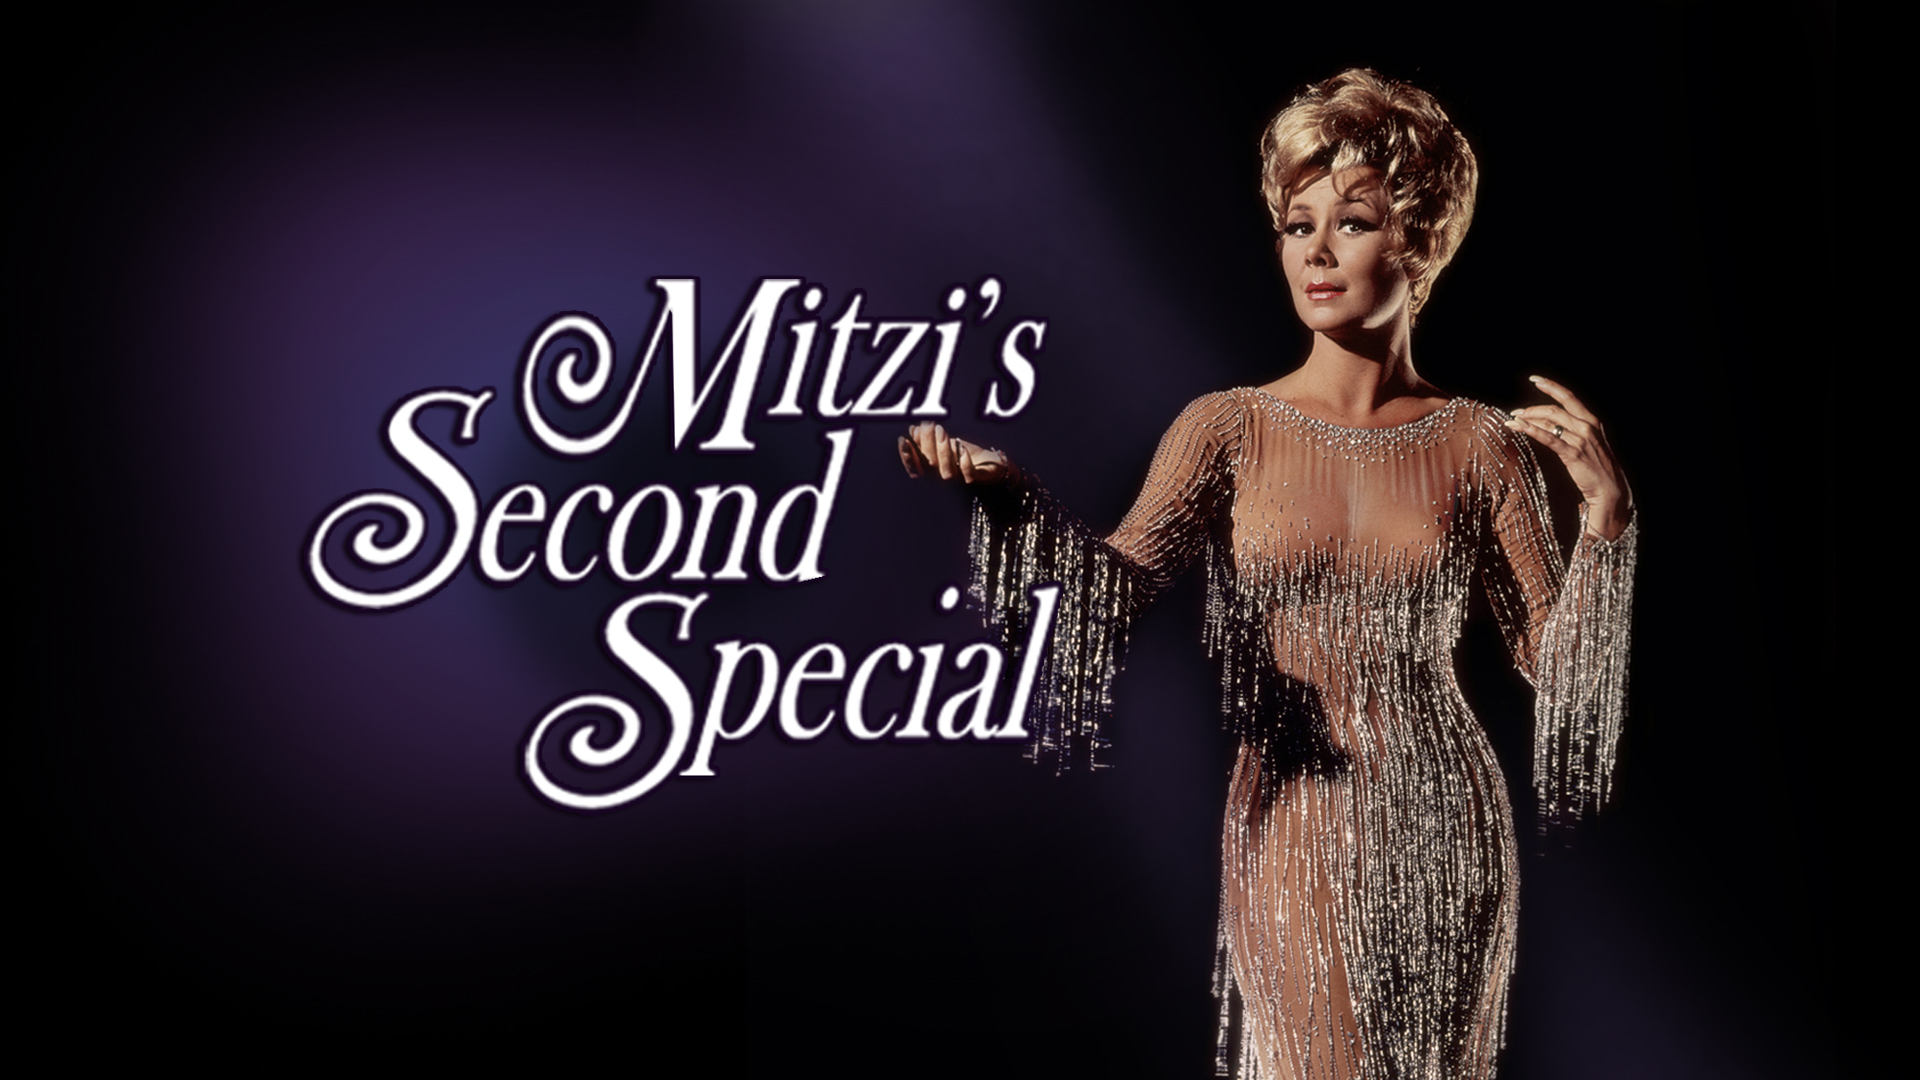 Mitzi's Second Special